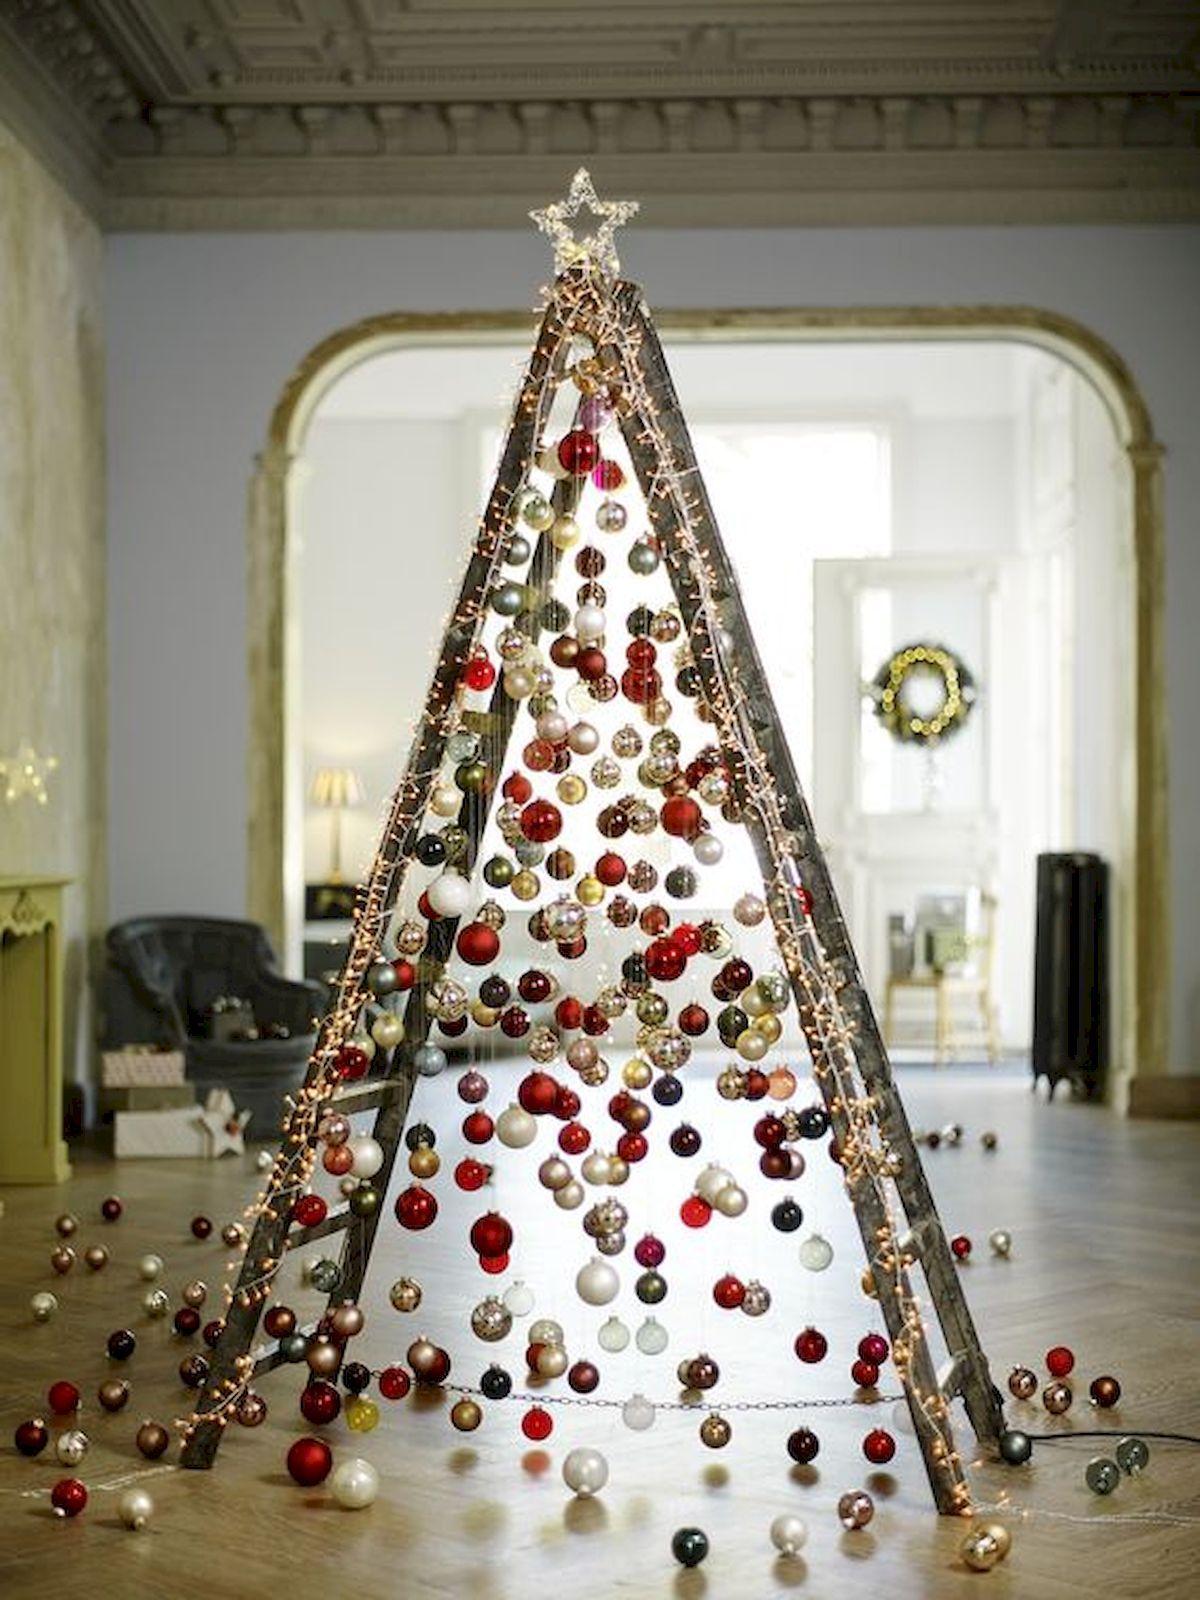 Gorgeous 40 Unique Christmas Tree Ideas Decorations Https Roomadness Com 2018 06 07 Unique Christmas Trees Unusual Christmas Trees Traditional Christmas Tree